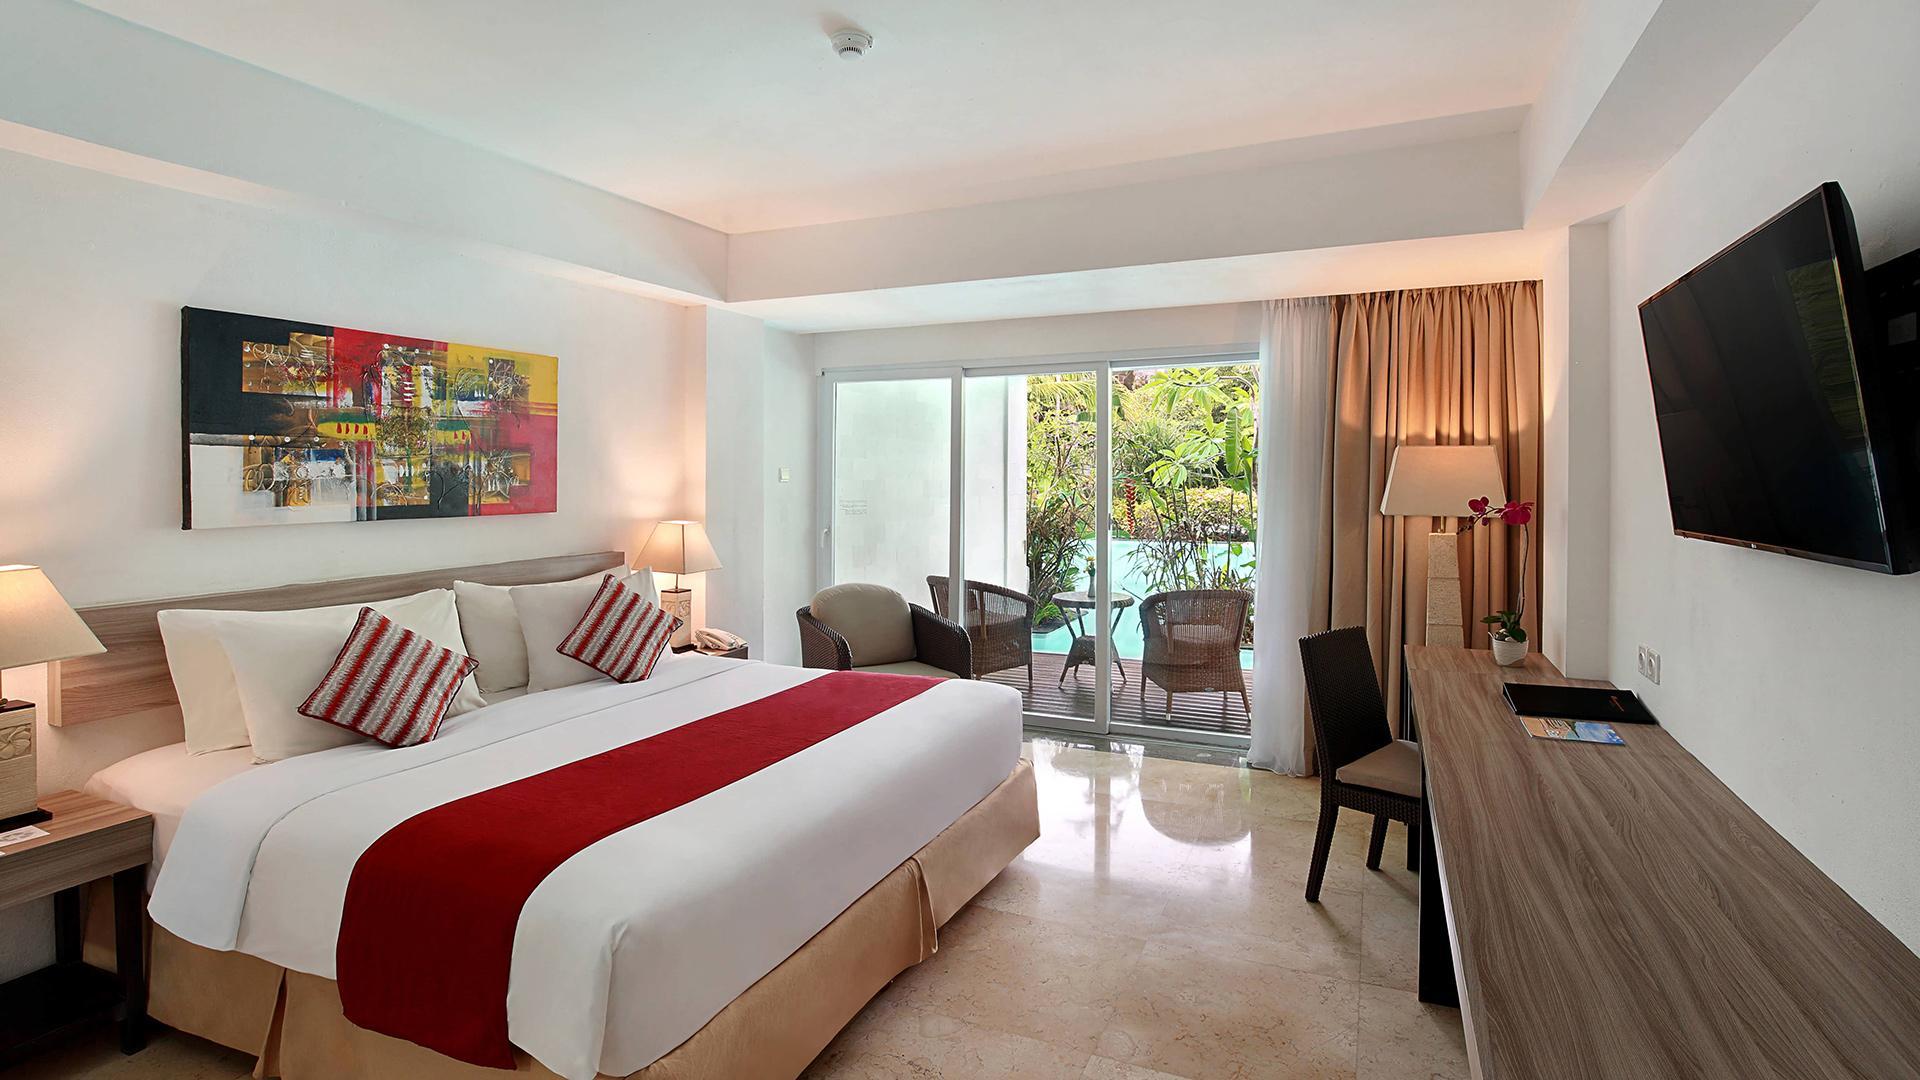 Lagoon Pool Access Room  image 1 at Swiss-Belhotel Segara Nusa Dua by Kabupaten Badung, Bali, Indonesia